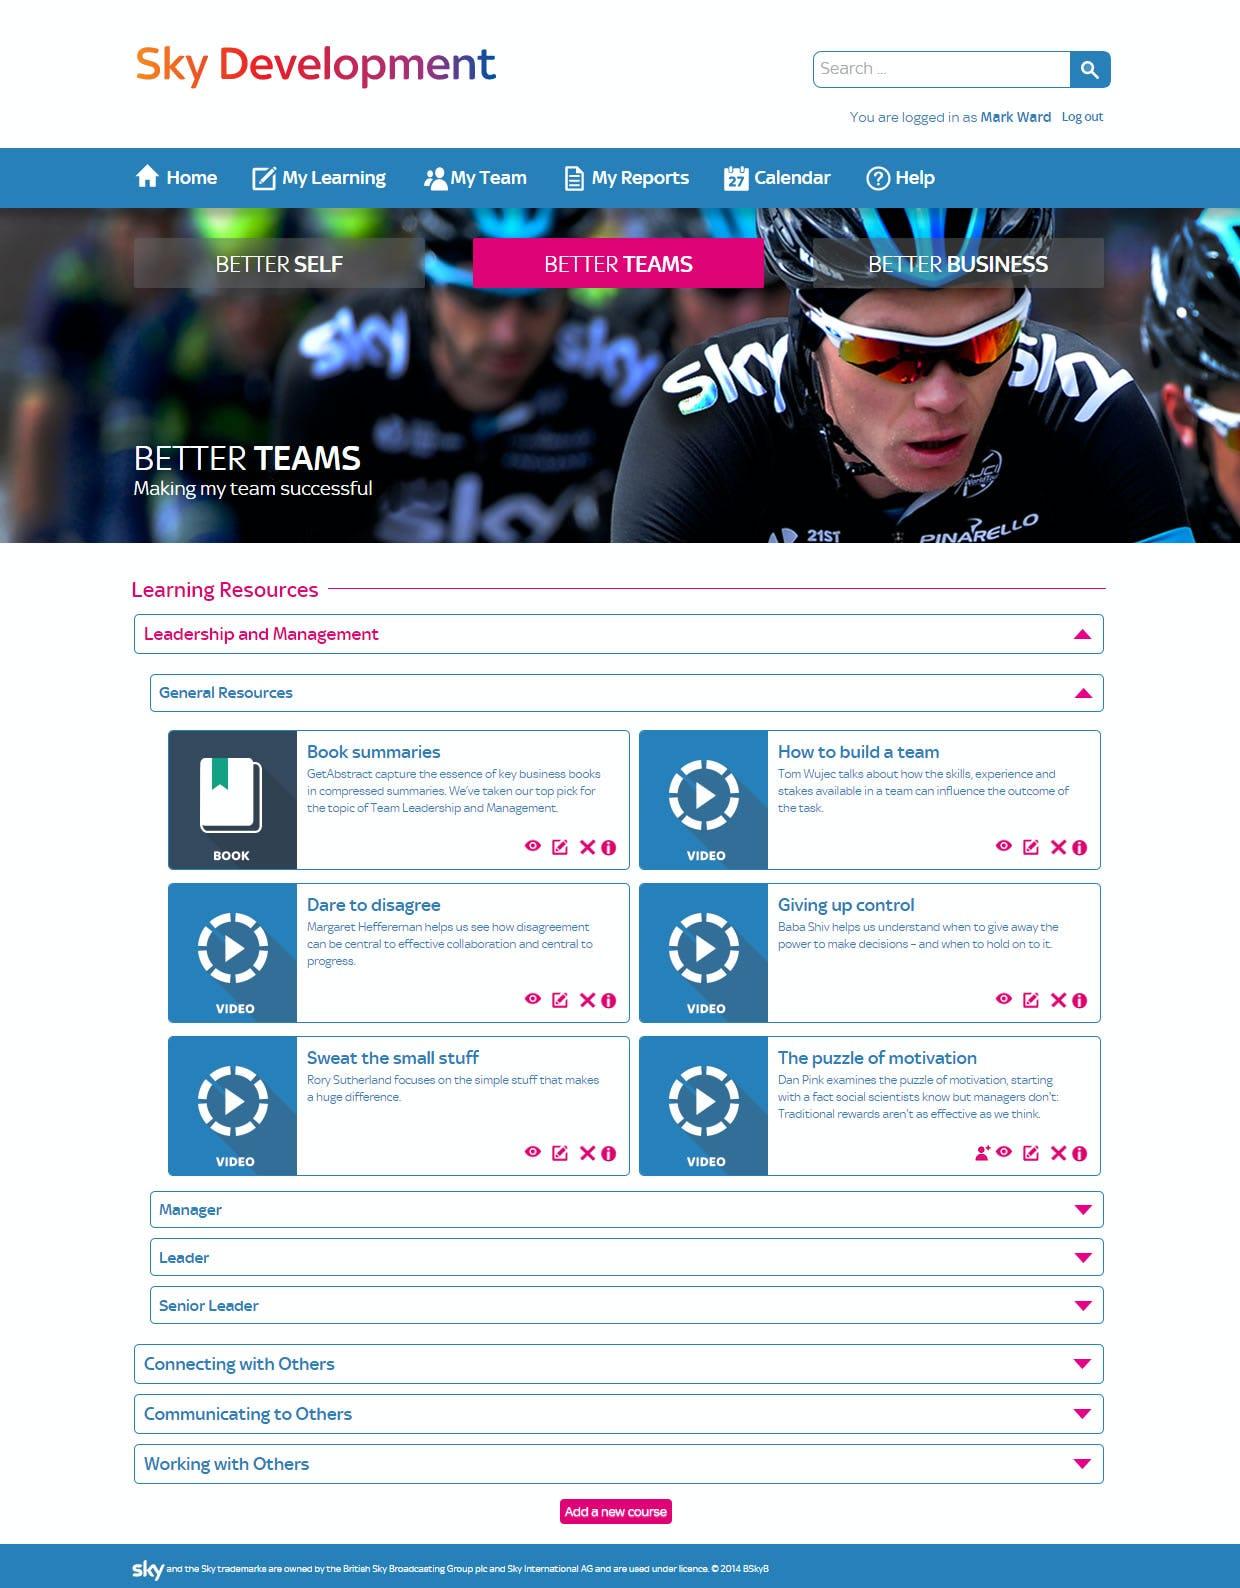 Totara - Team learning resources